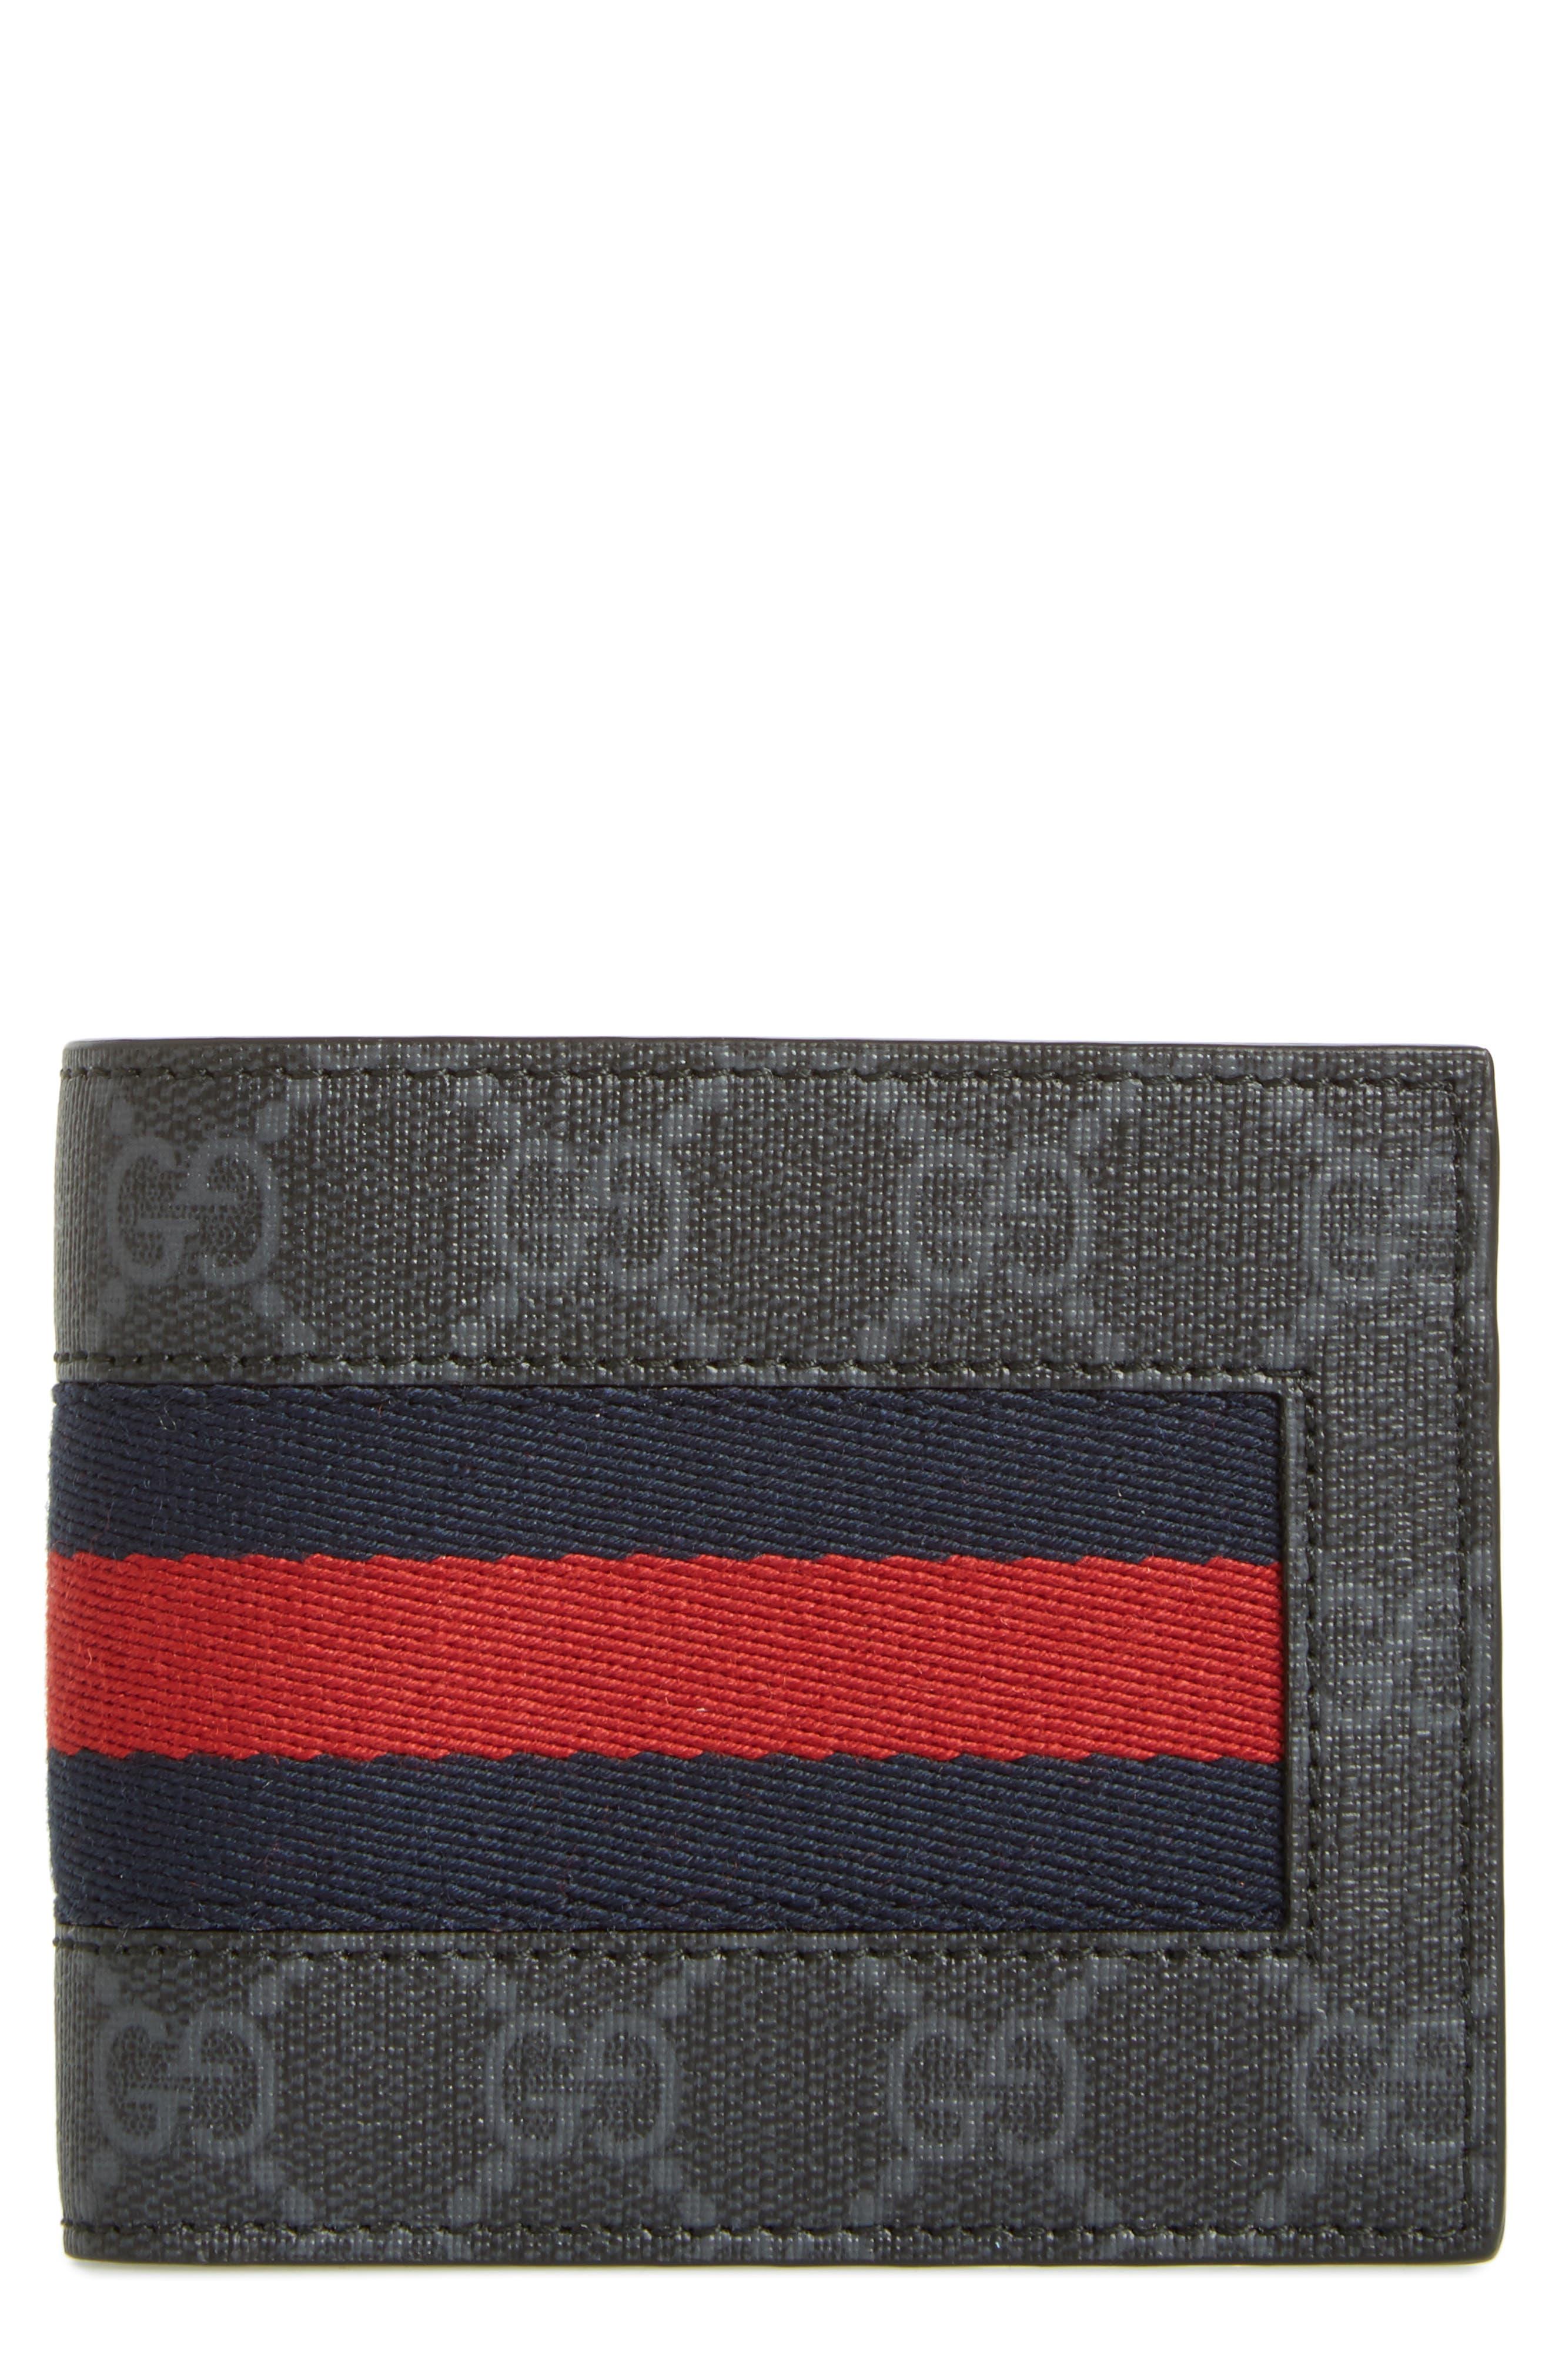 Alternate Image 1 Selected - Gucci Supreme Wallet